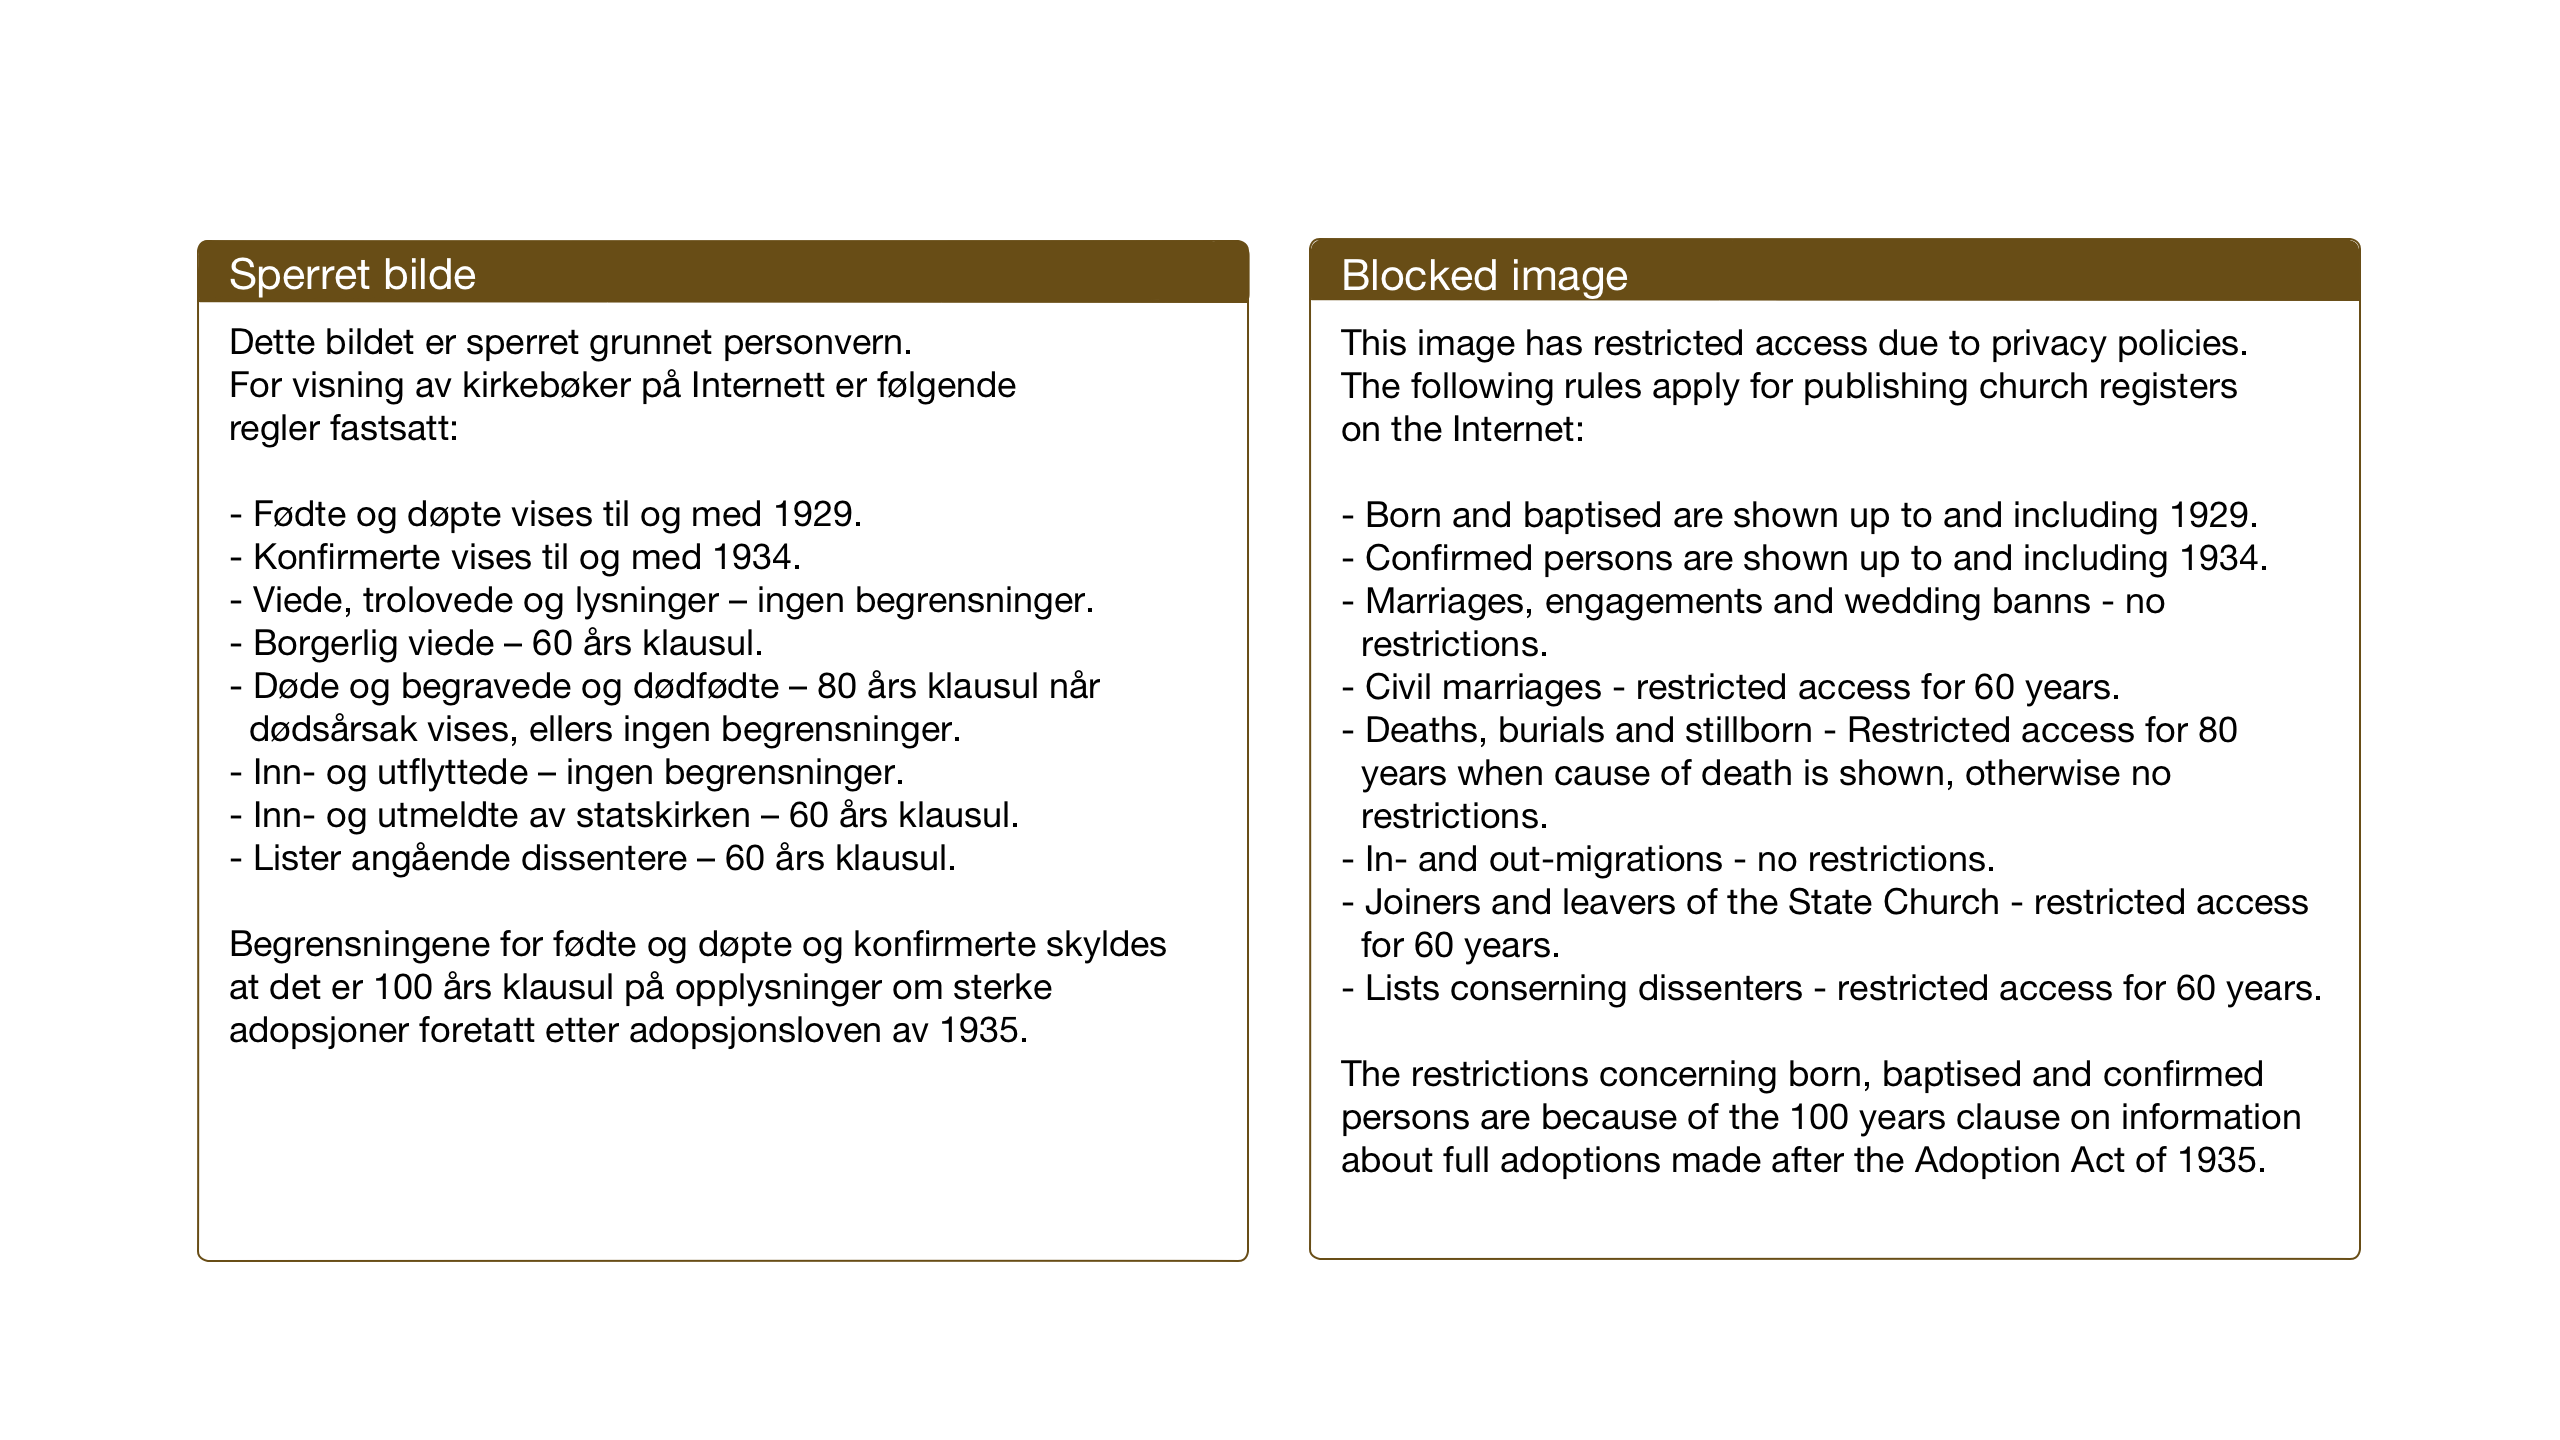 SAT, Ministerialprotokoller, klokkerbøker og fødselsregistre - Nordland, 847/L0680: Klokkerbok nr. 847C08, 1930-1947, s. 302